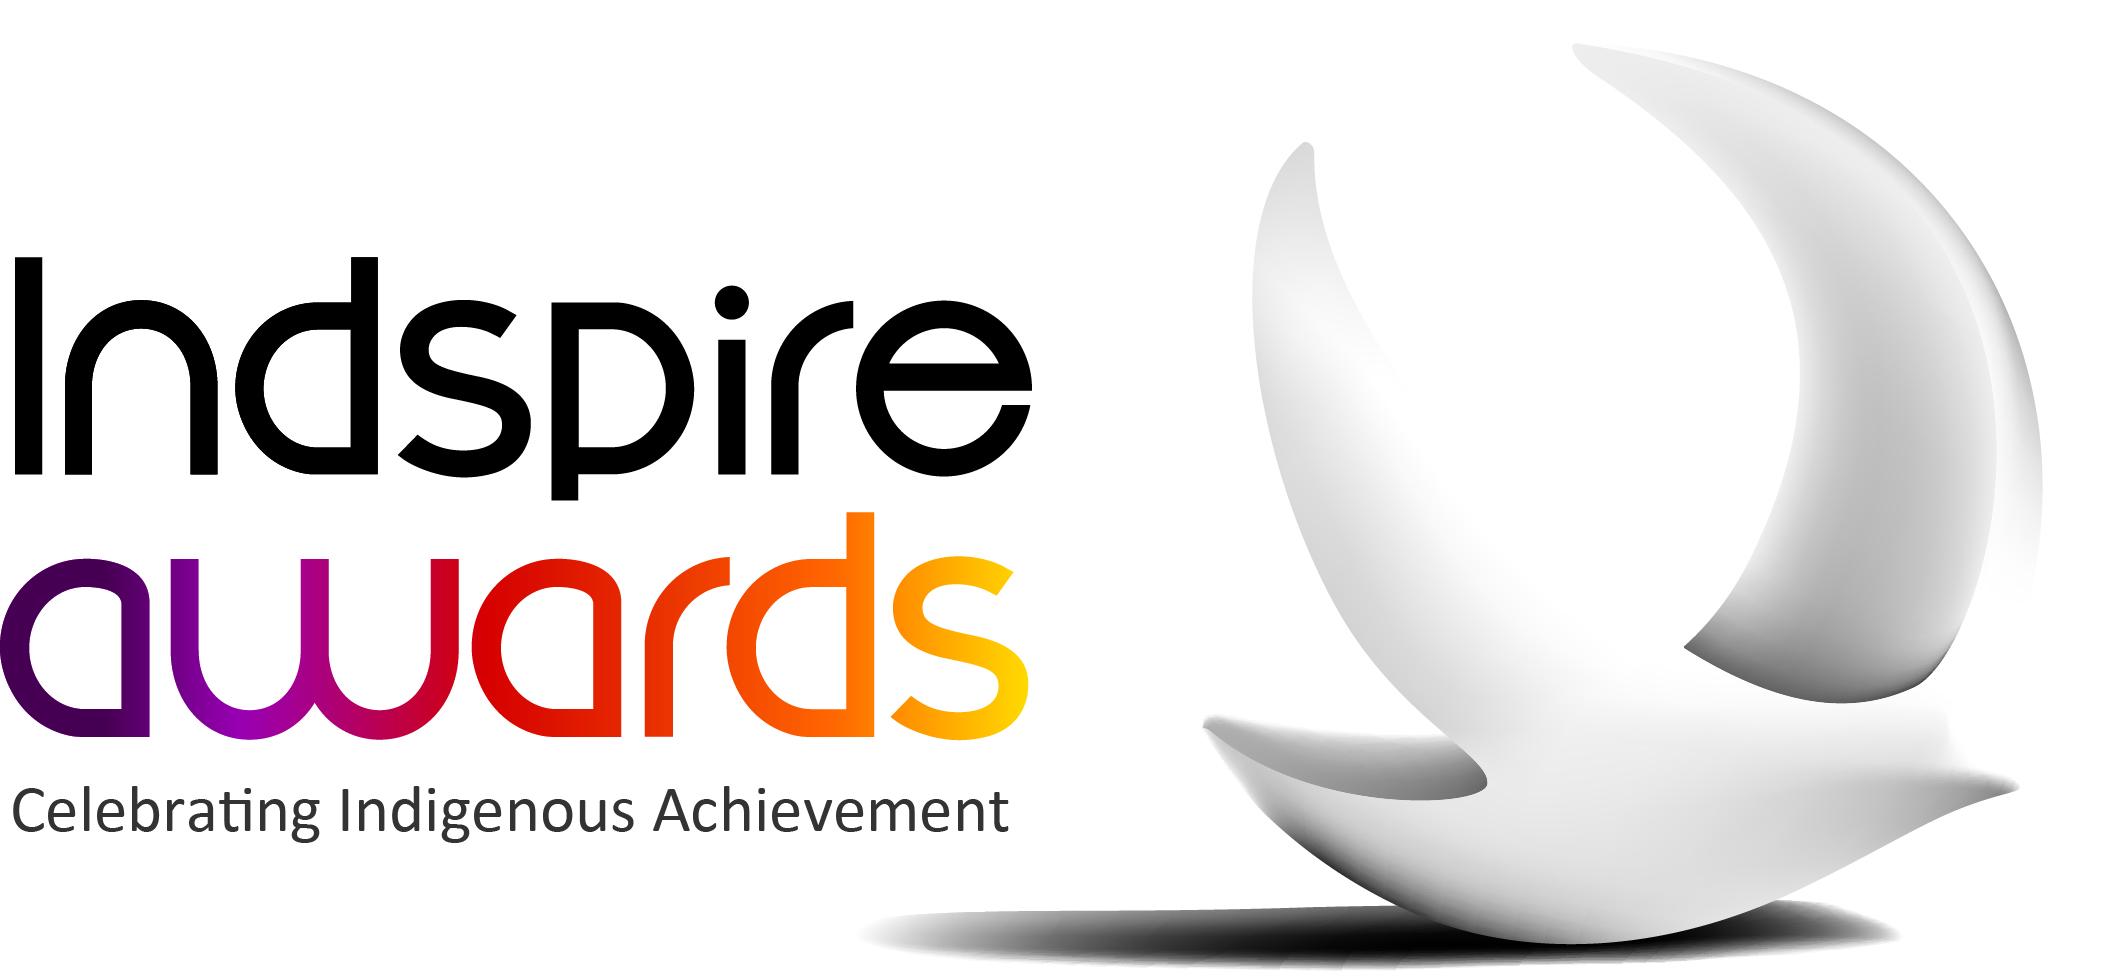 indspire-awards.jpg